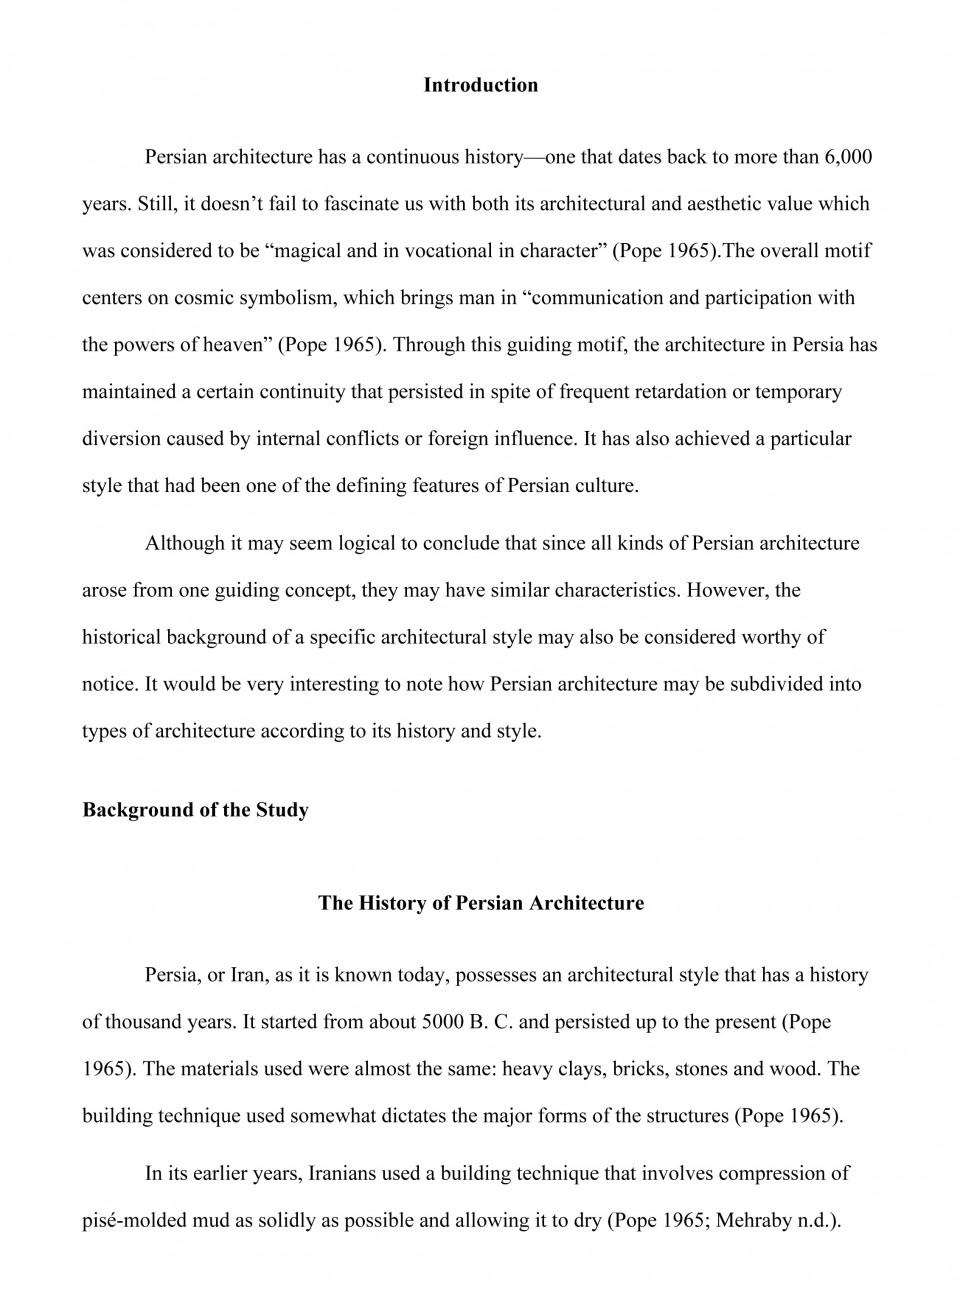 018 Persuasive Essay Structure Example On Global Warming Poemview Co Argumentative Esl Discursive Abortion Argument Regarding Ppt Rebuttal Igcse Pdf Outline Outstanding Prezi Nat 5 960